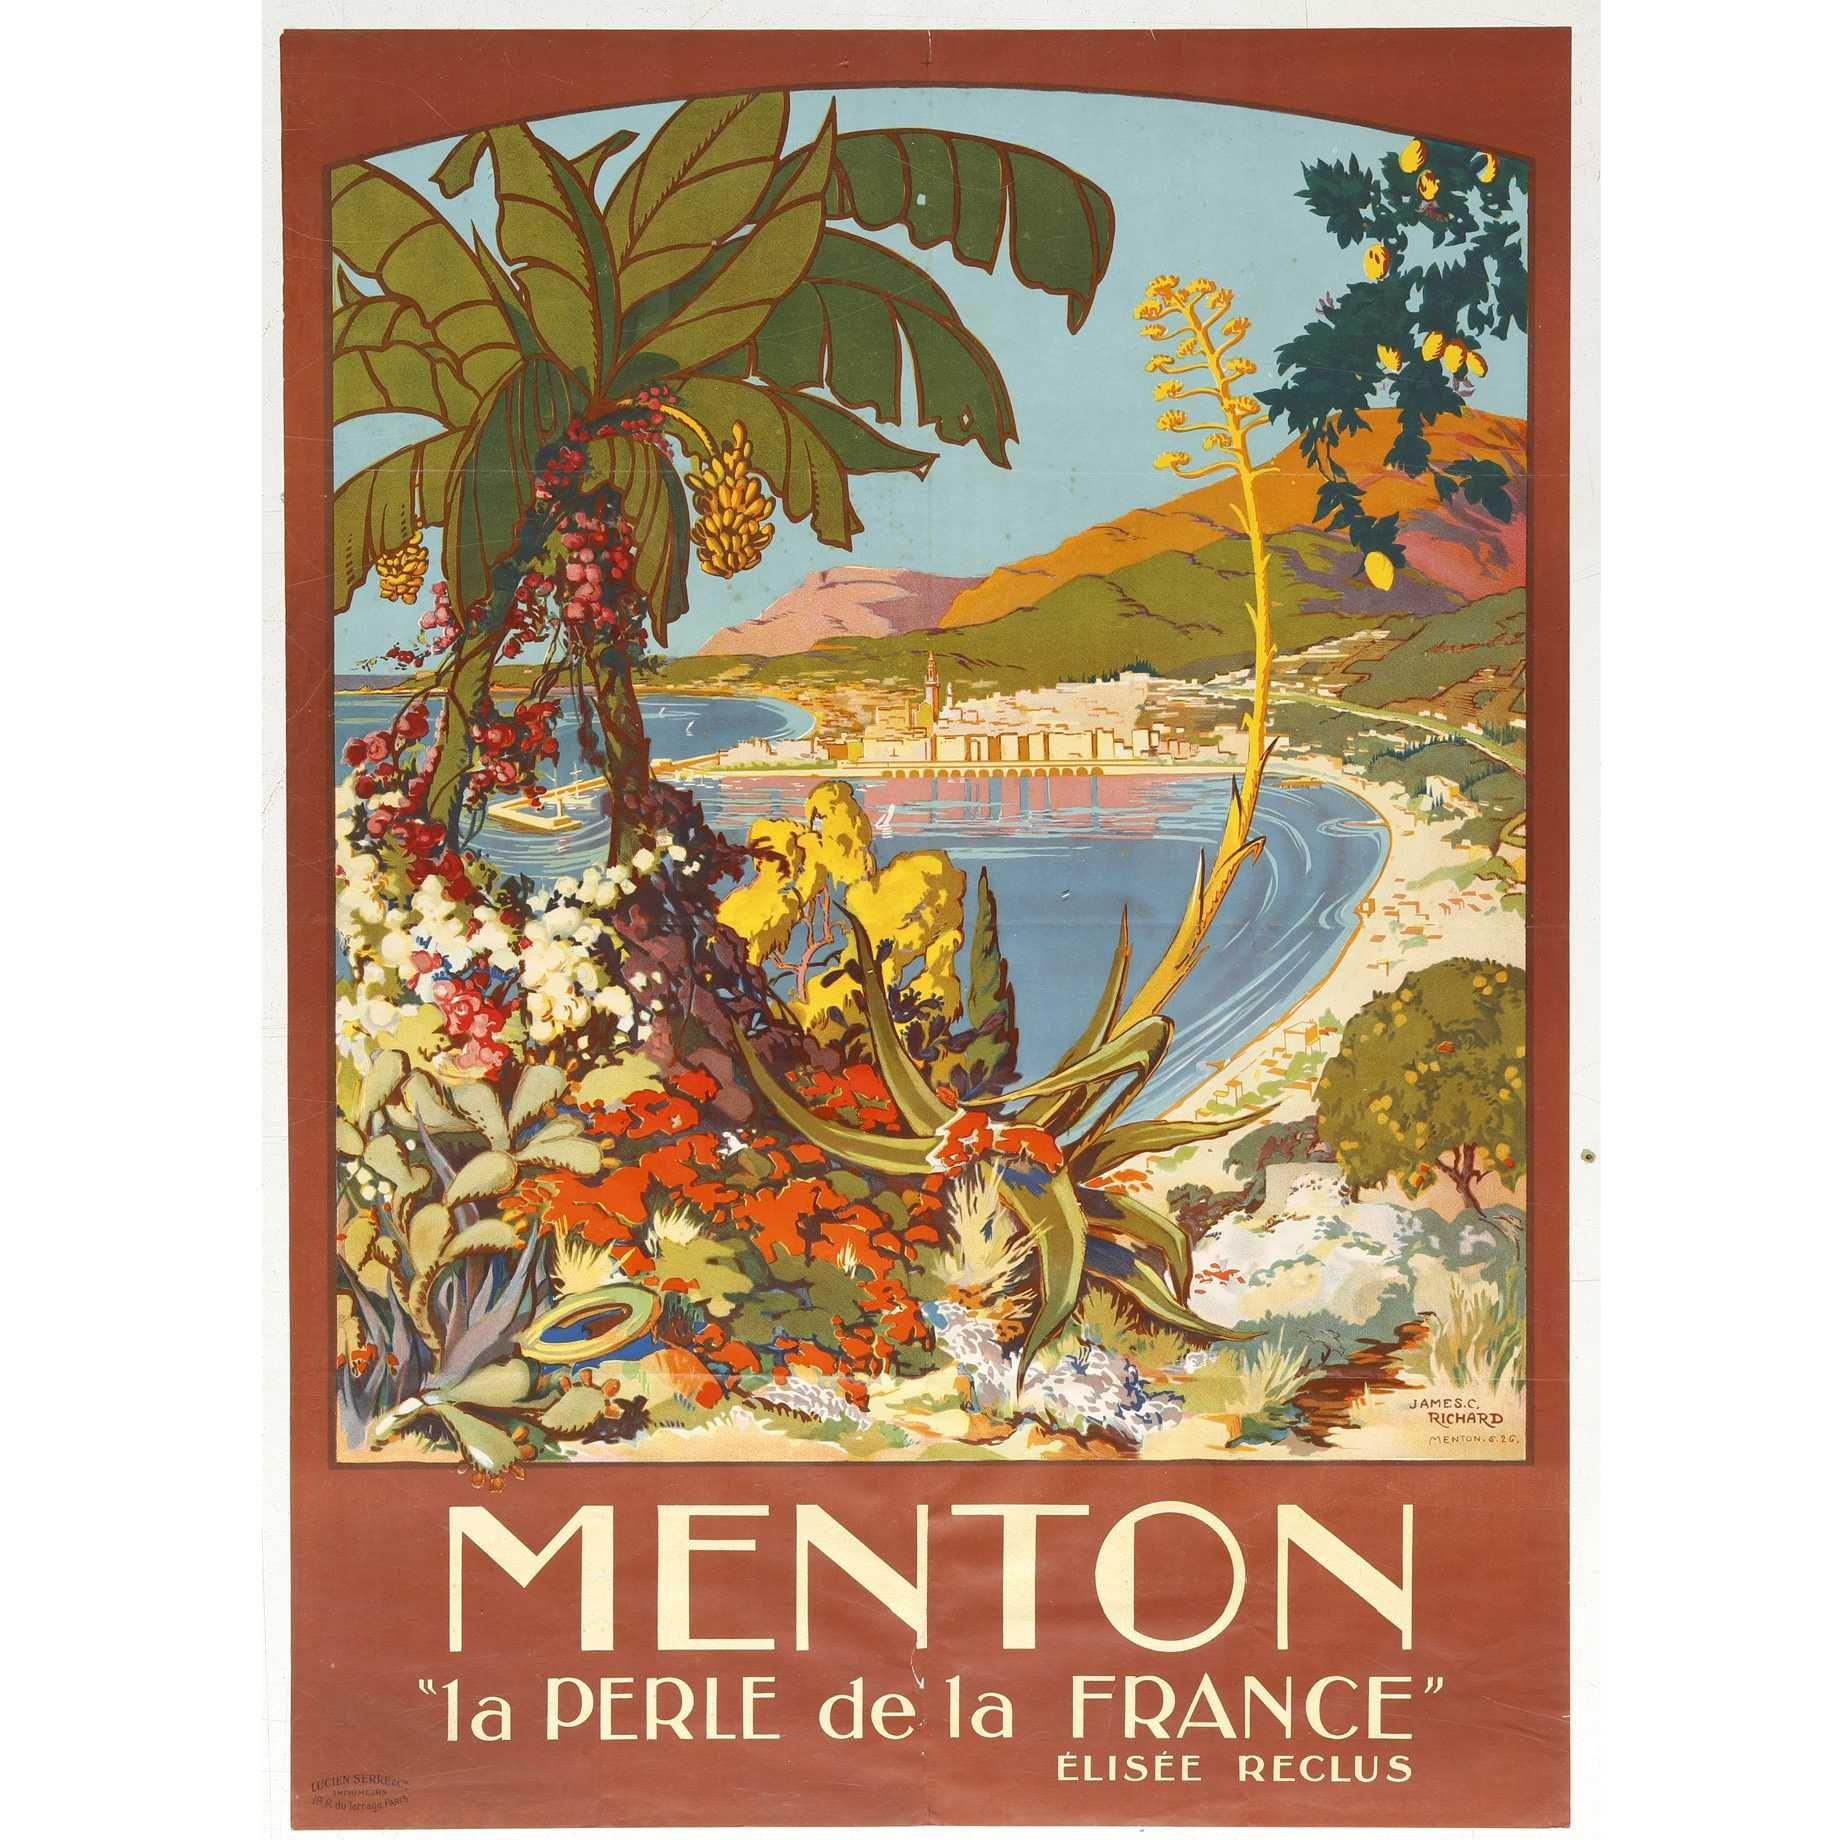 Menton la Perle de la France French Riviera Vintage Travel Advertisement Poster